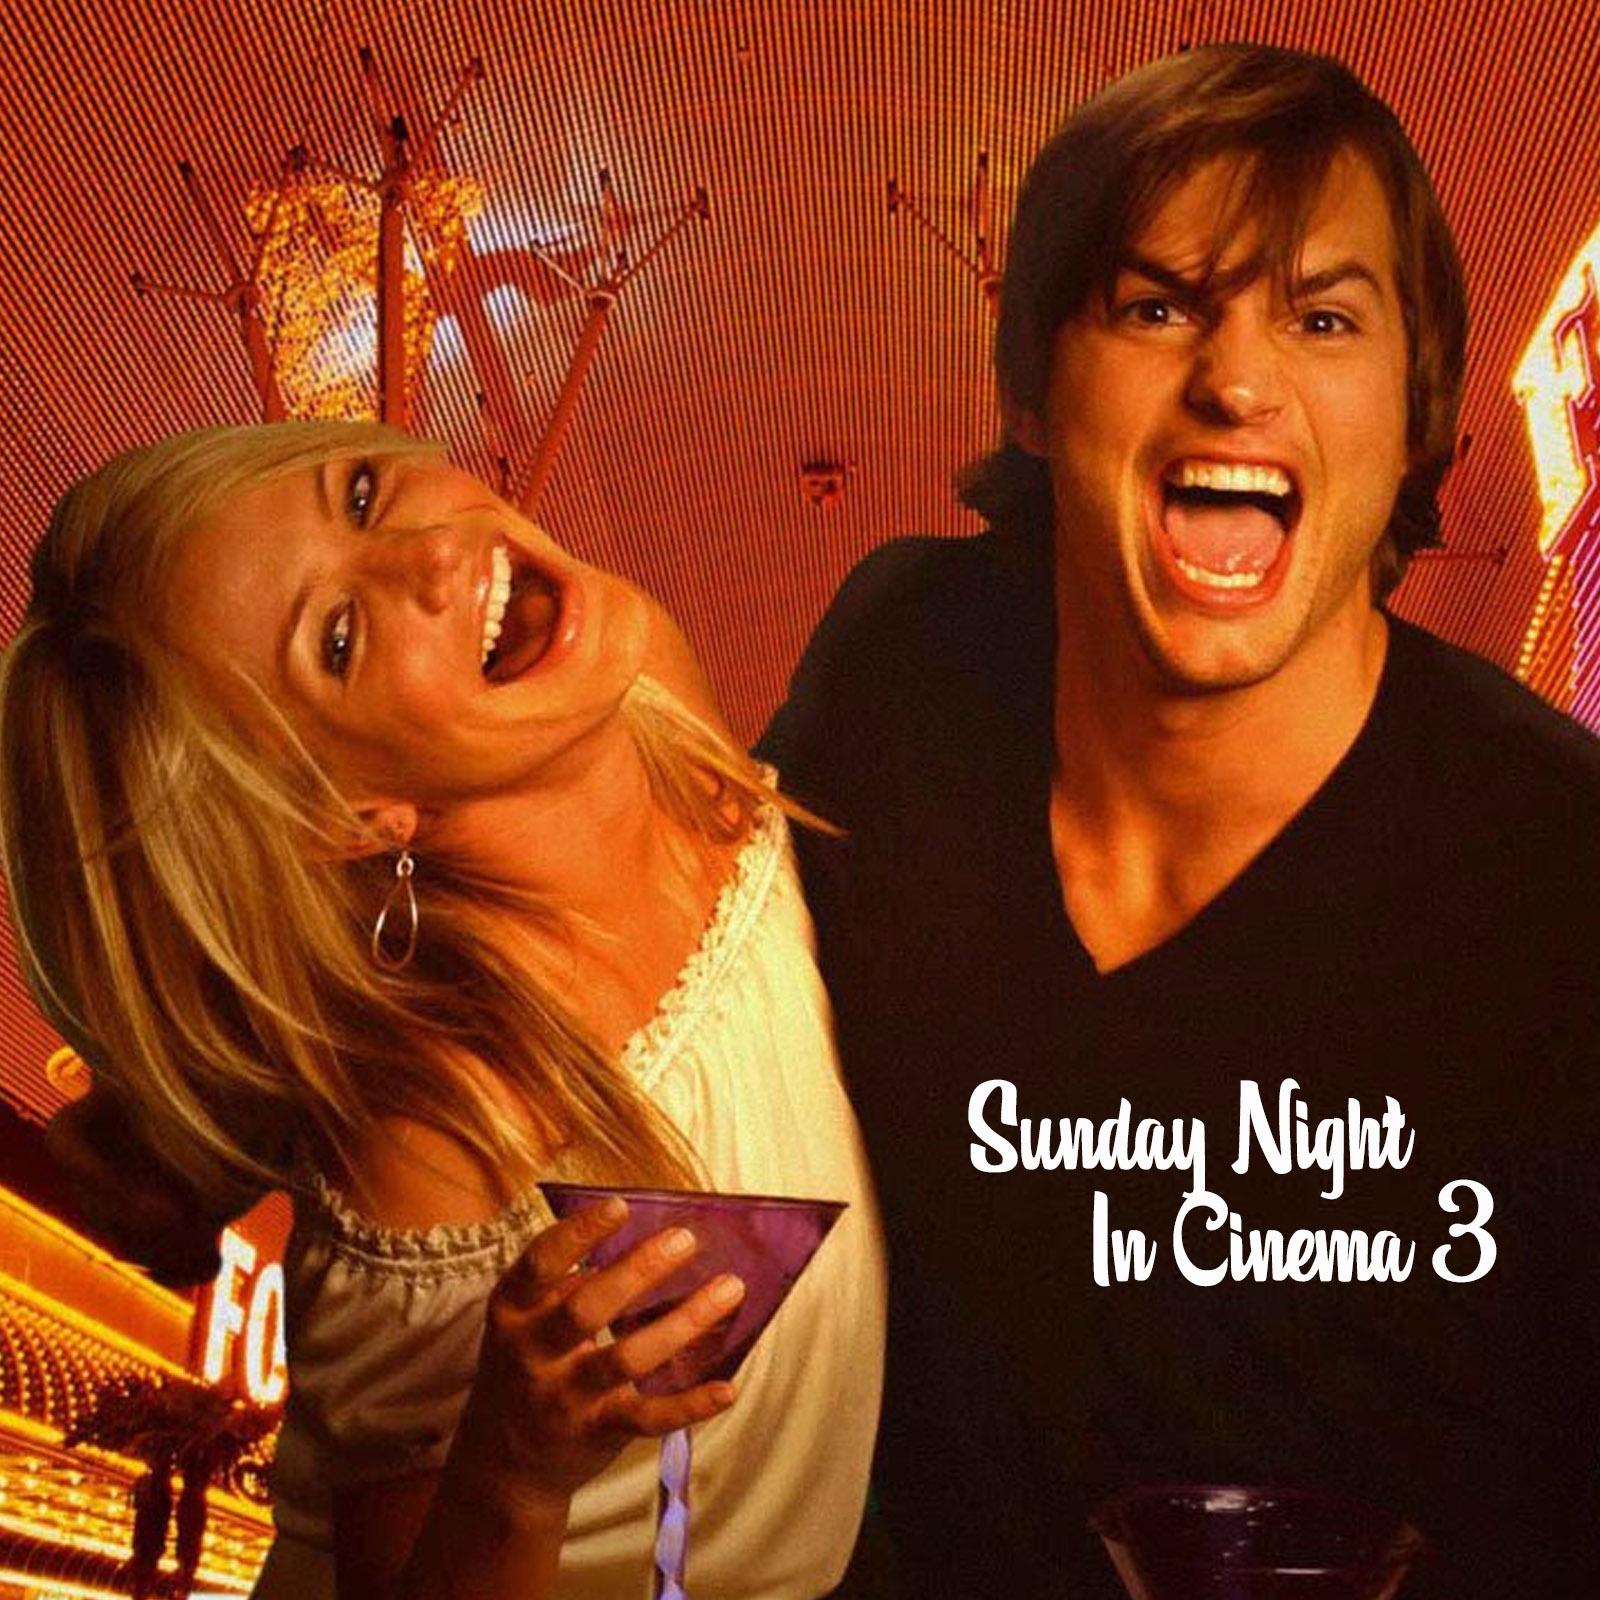 Sunday Night in Cinema 3 Episode 11